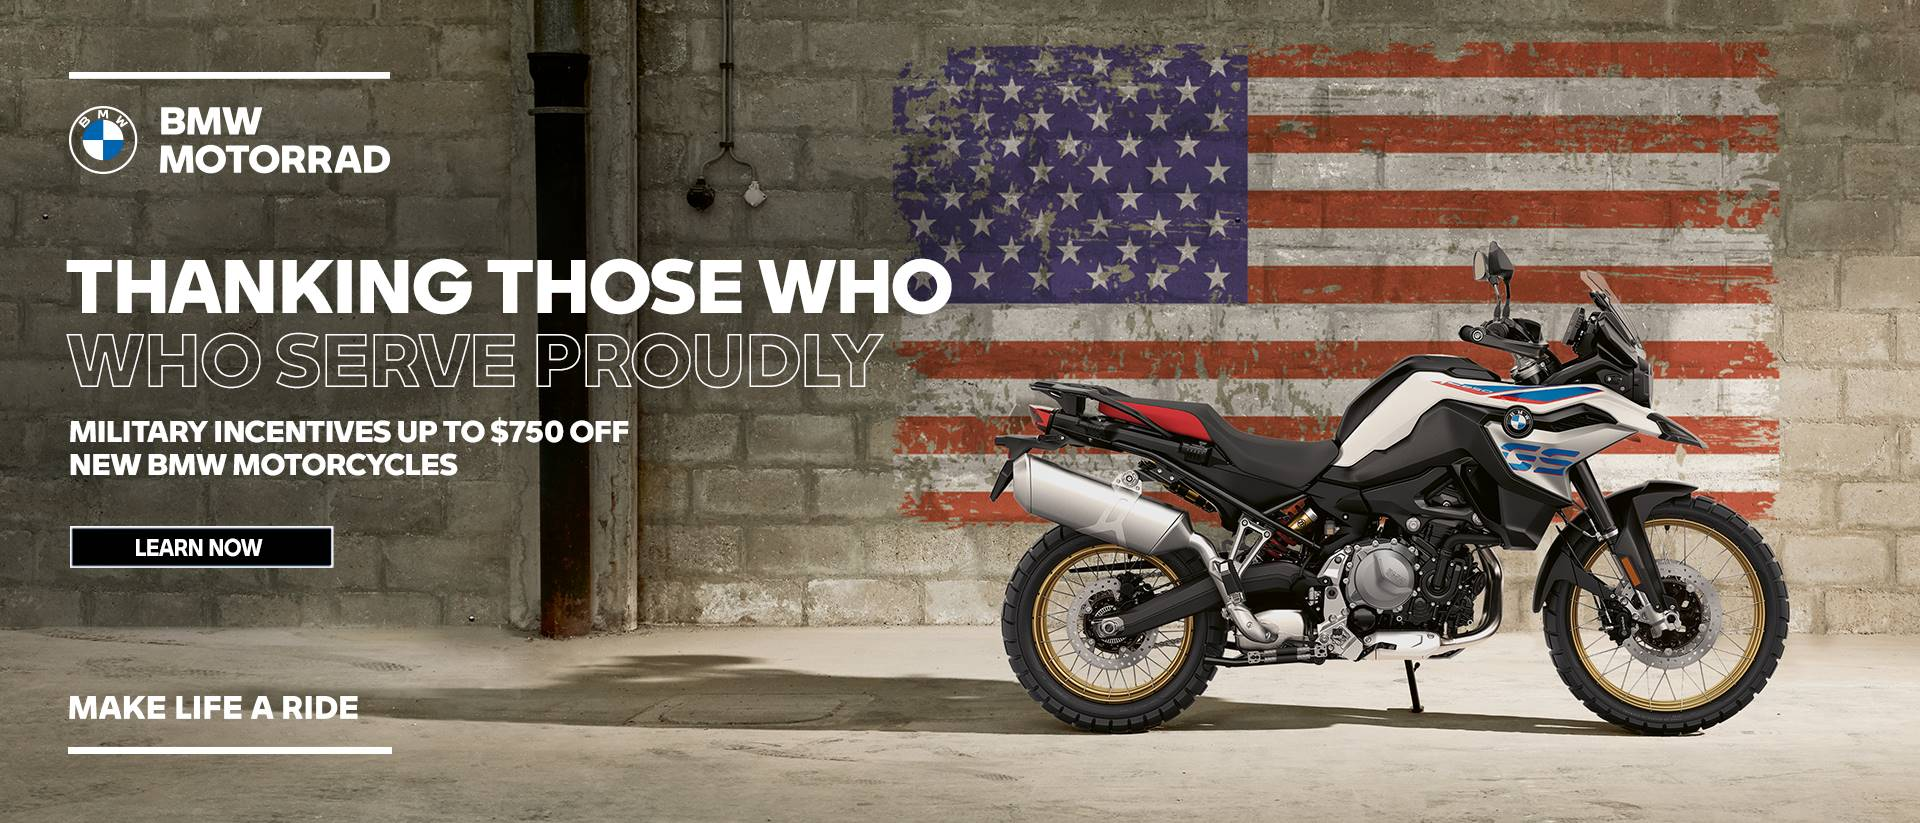 Quaker City Motor Sport Philadelphia Bmw Ducati Triumph Royal Enfield Motorcycles